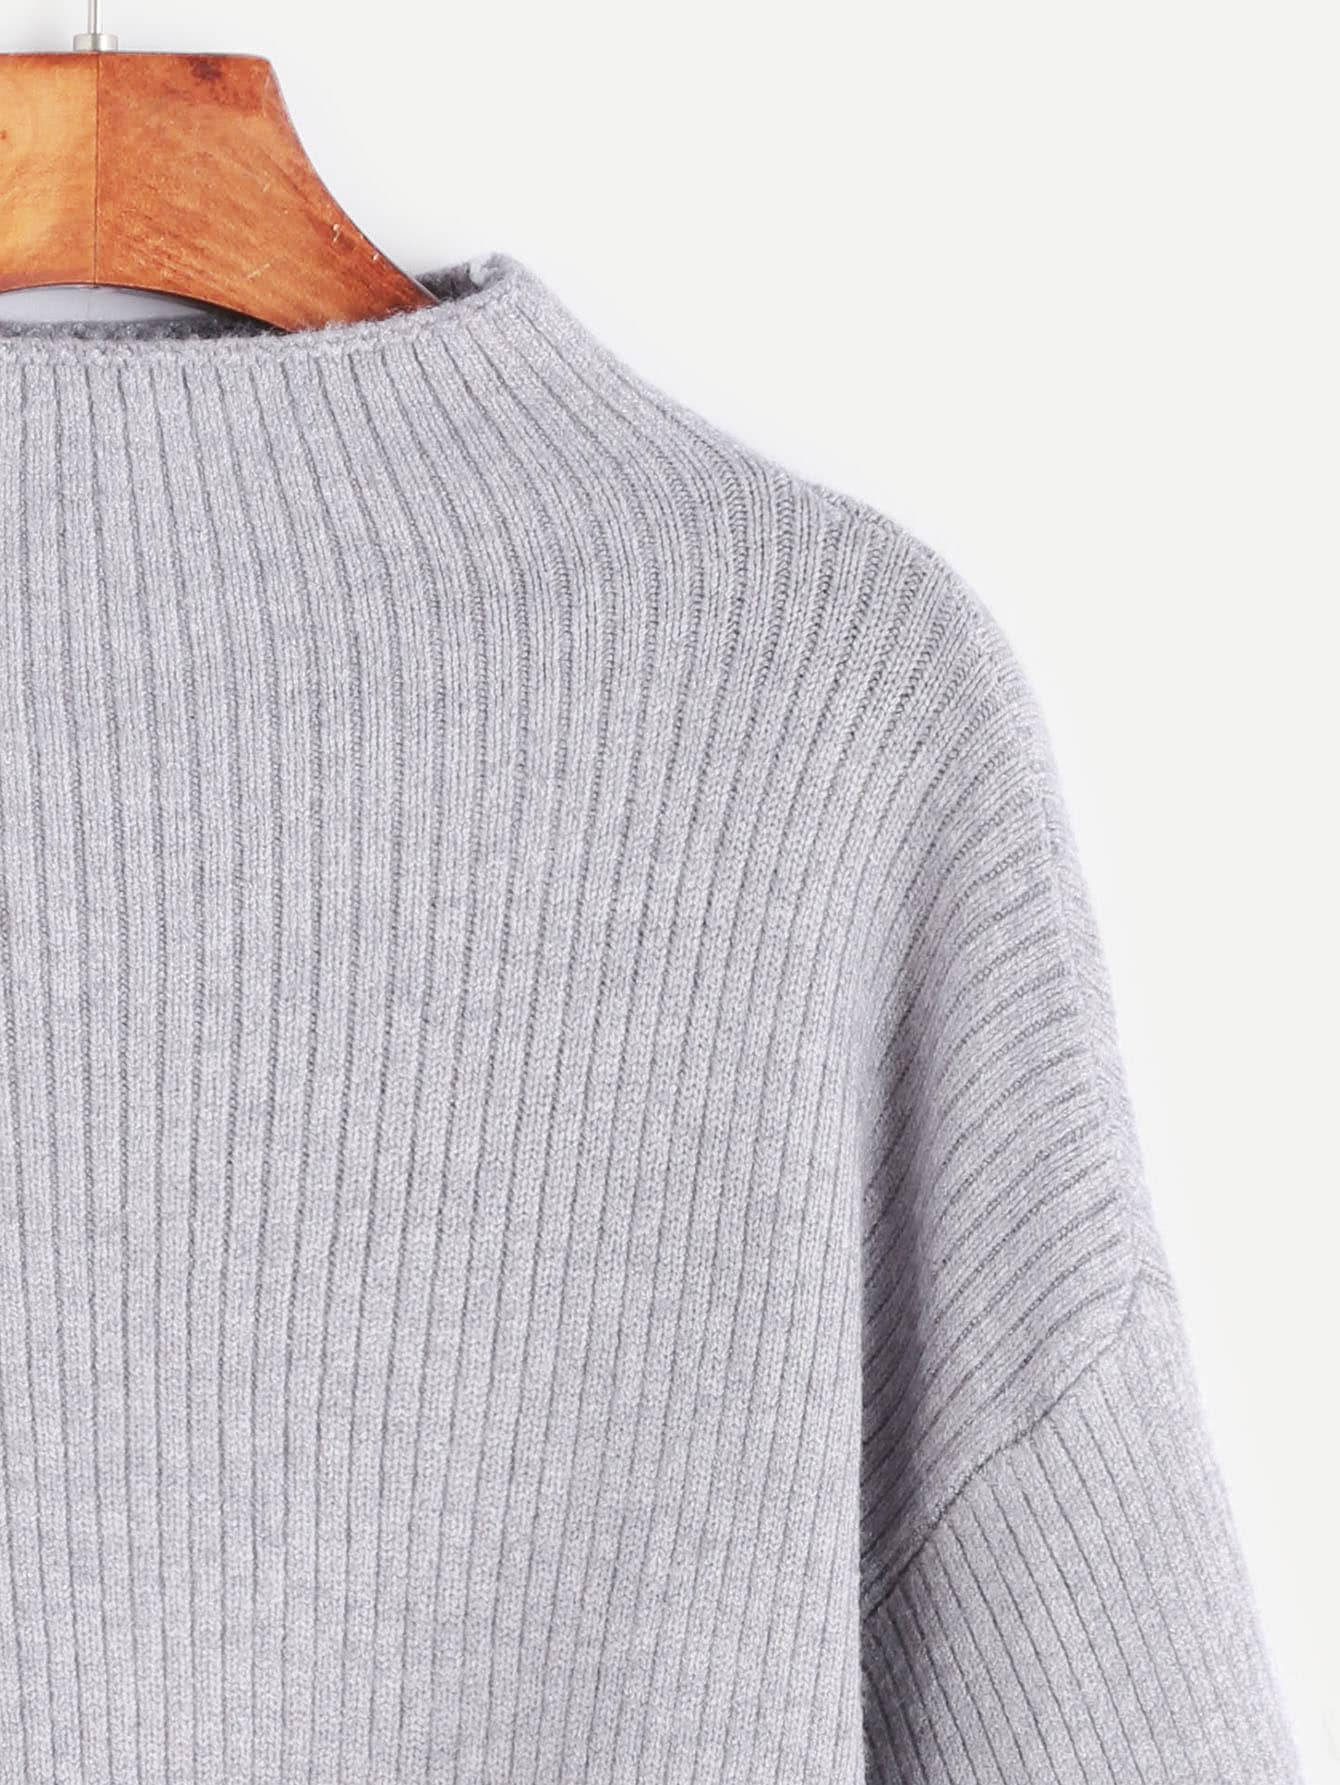 sweater161109101_2